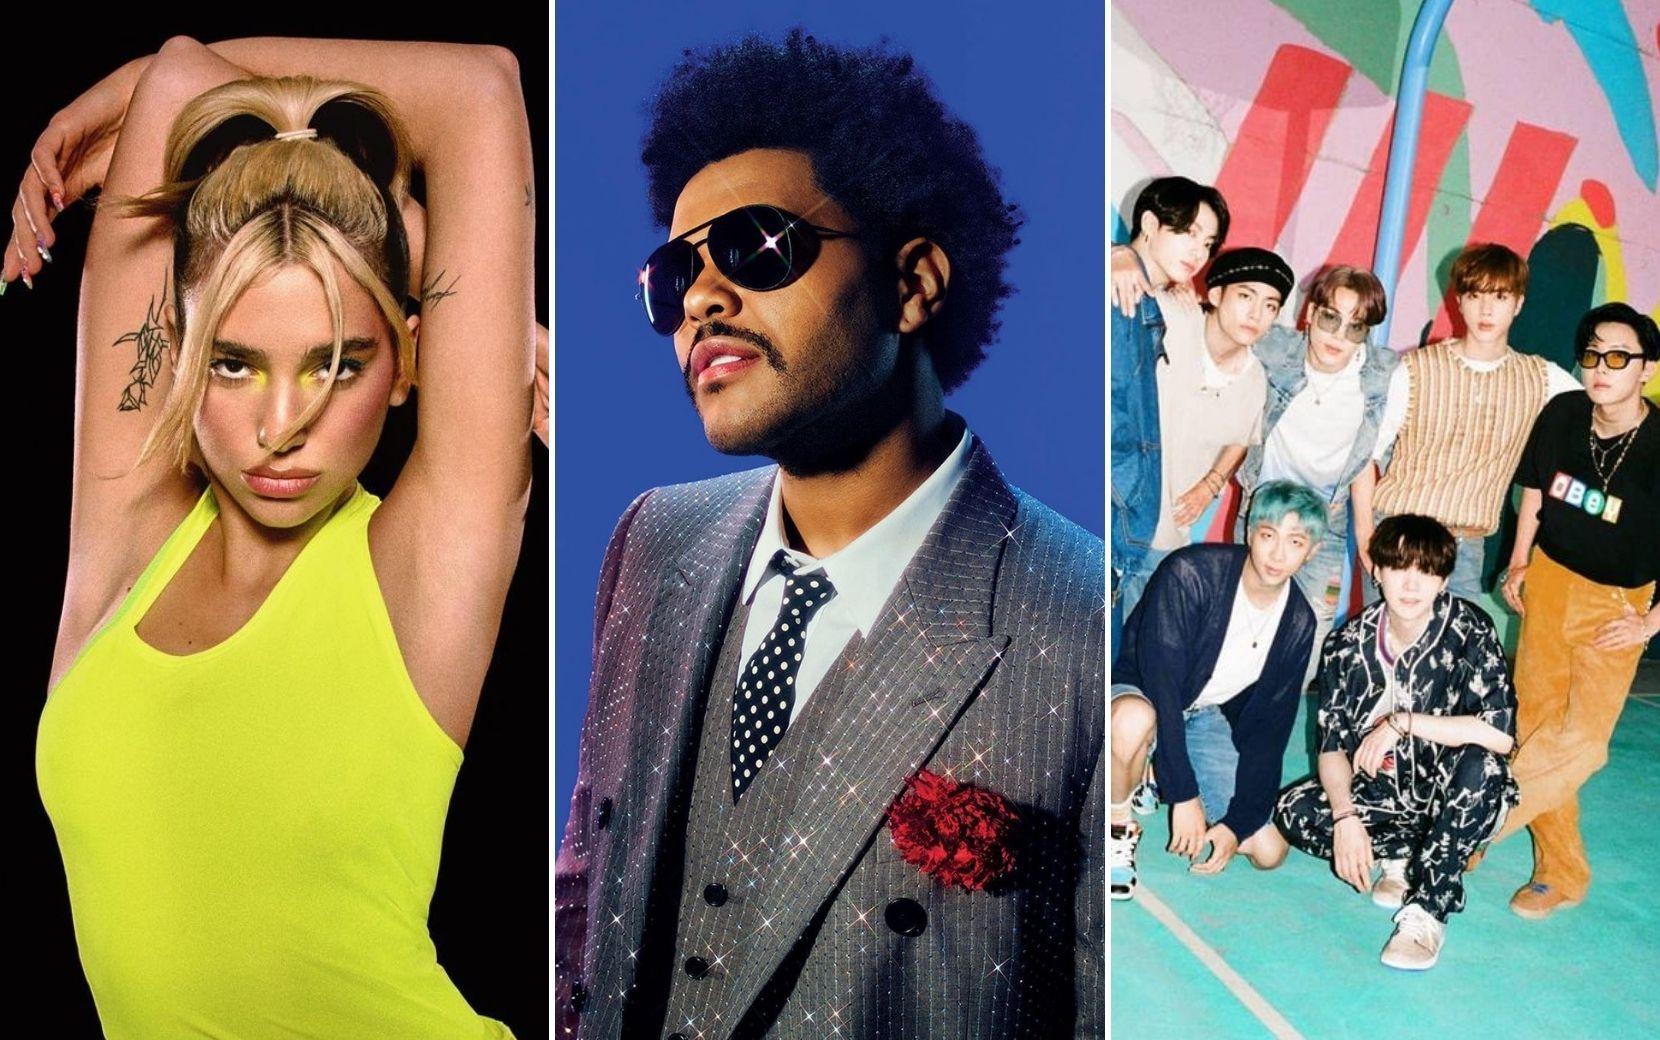 Dua Lipa, The Weeknd, BTS e mais: confira a lista completa de indicados ao BRIT Awards 2021